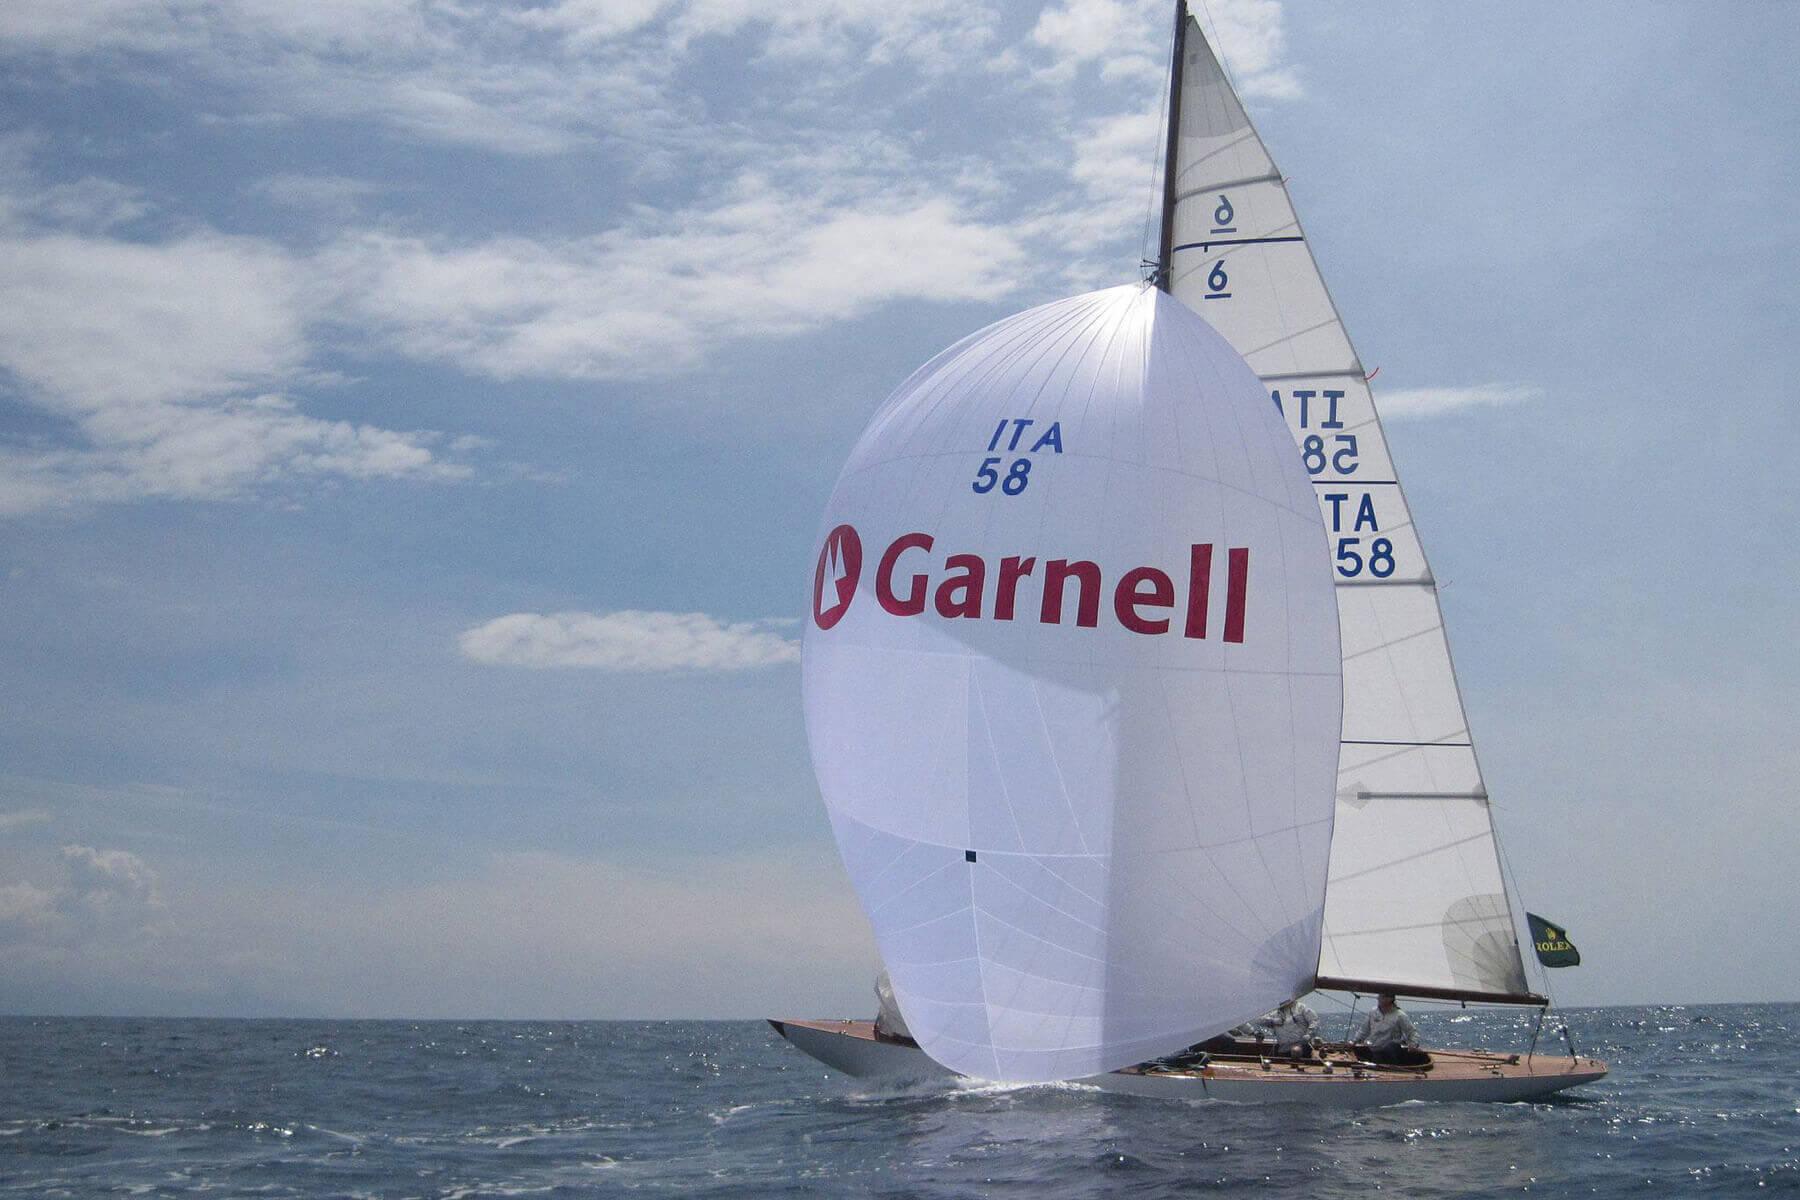 Una regata di Garnell